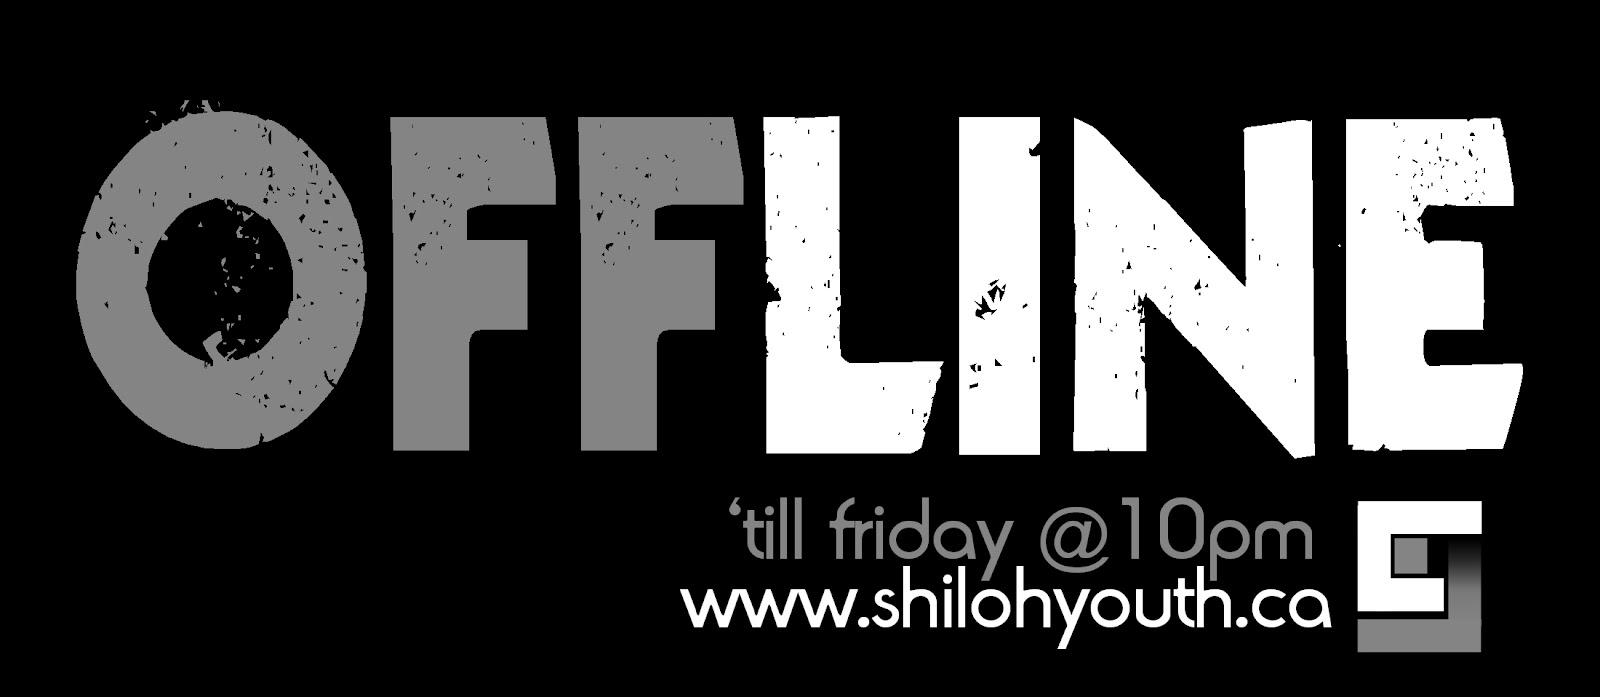 Artwork Uploads: Shiloh Offline Banner